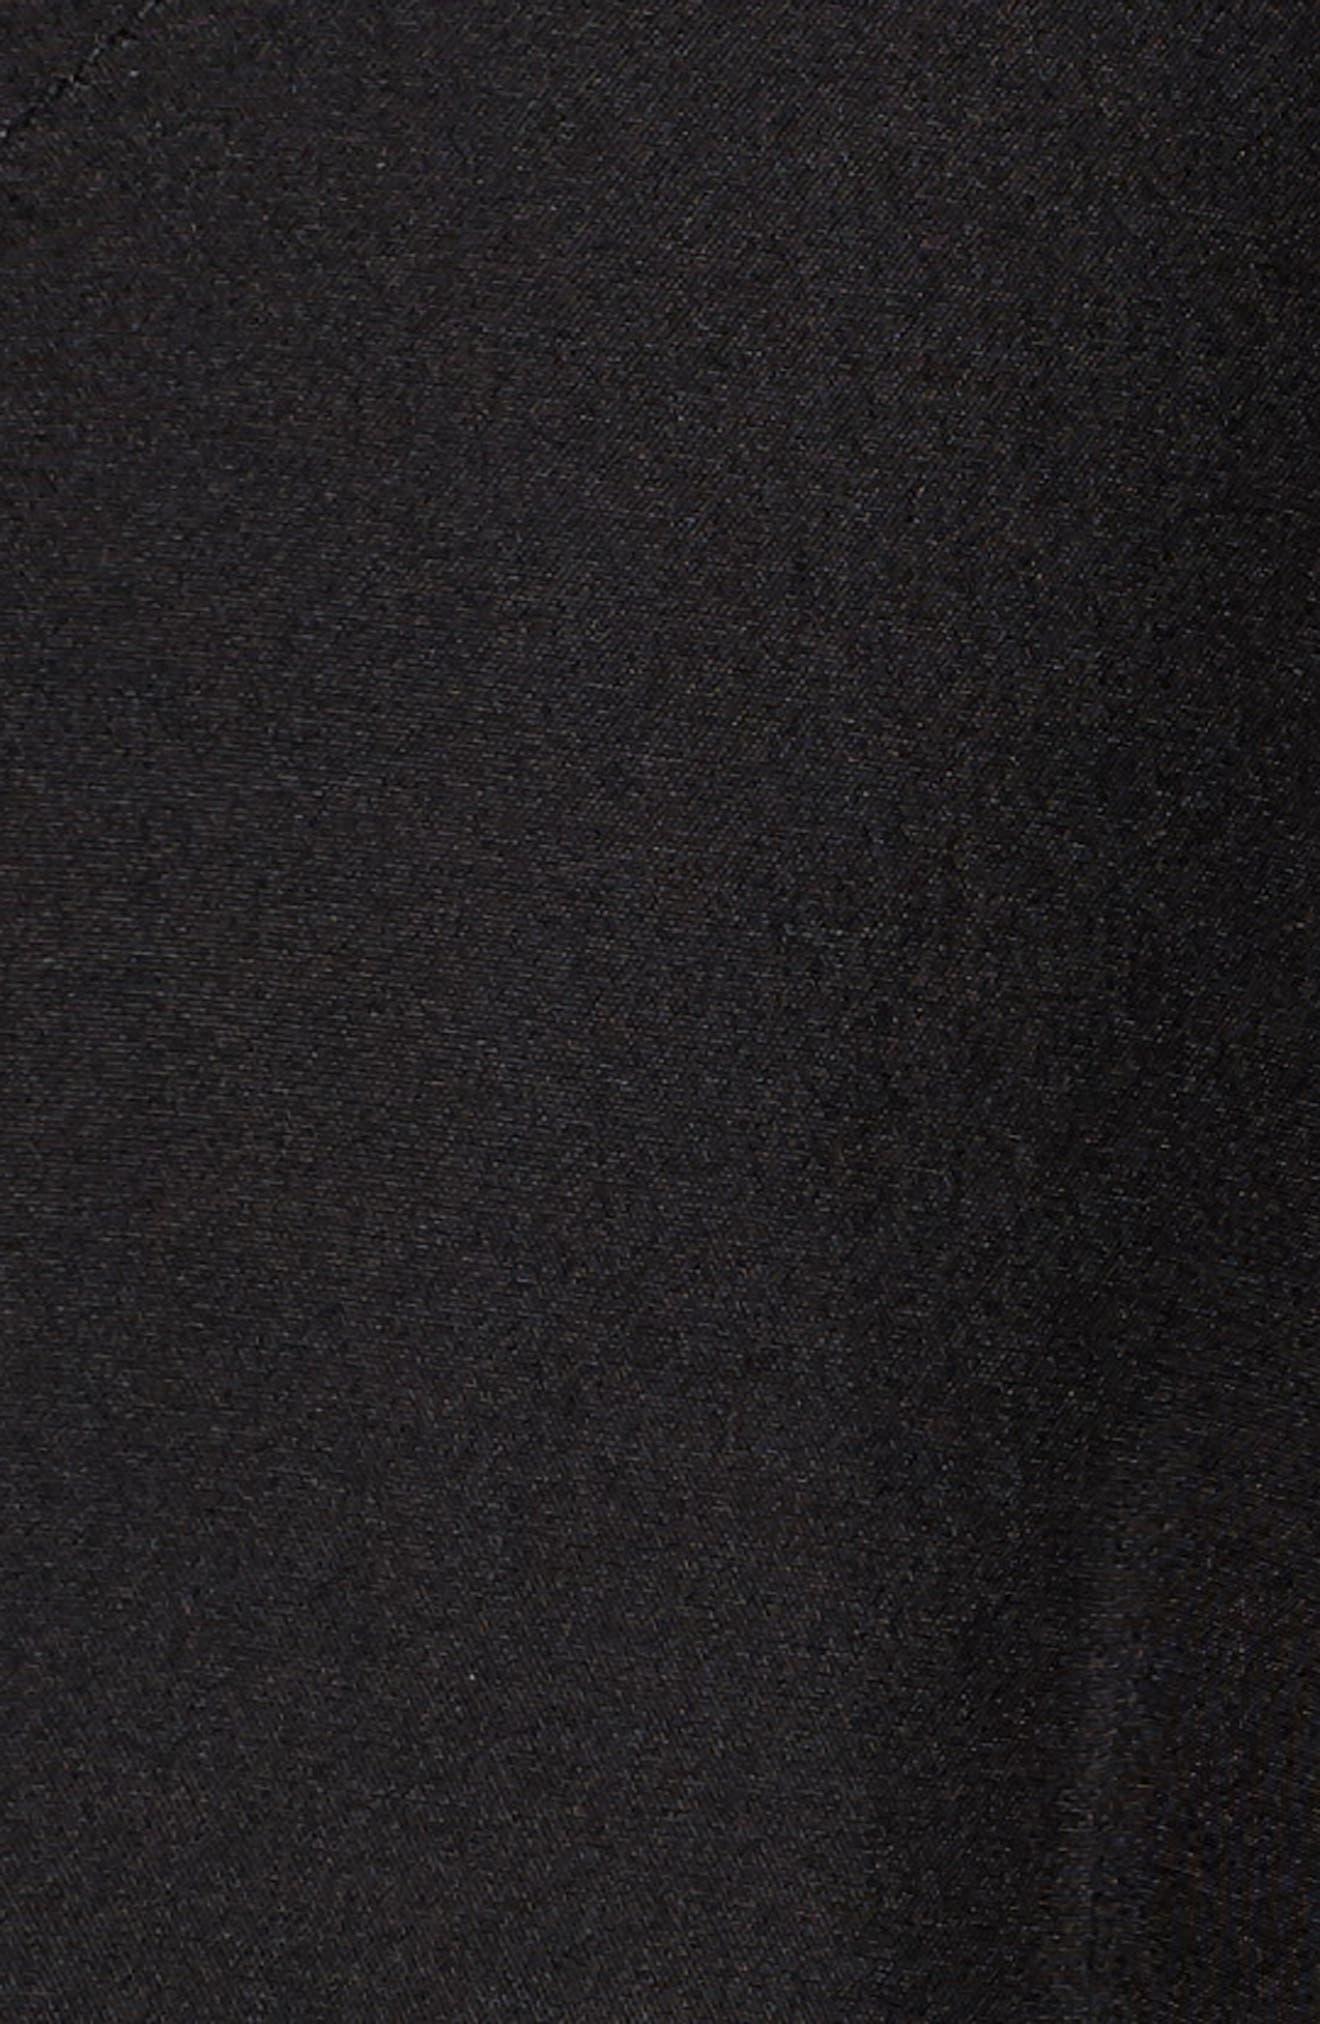 Couture Packable Silk Coat with Genuine Fox Fur & Genuine Rabbit Fur,                             Alternate thumbnail 6, color,                             001